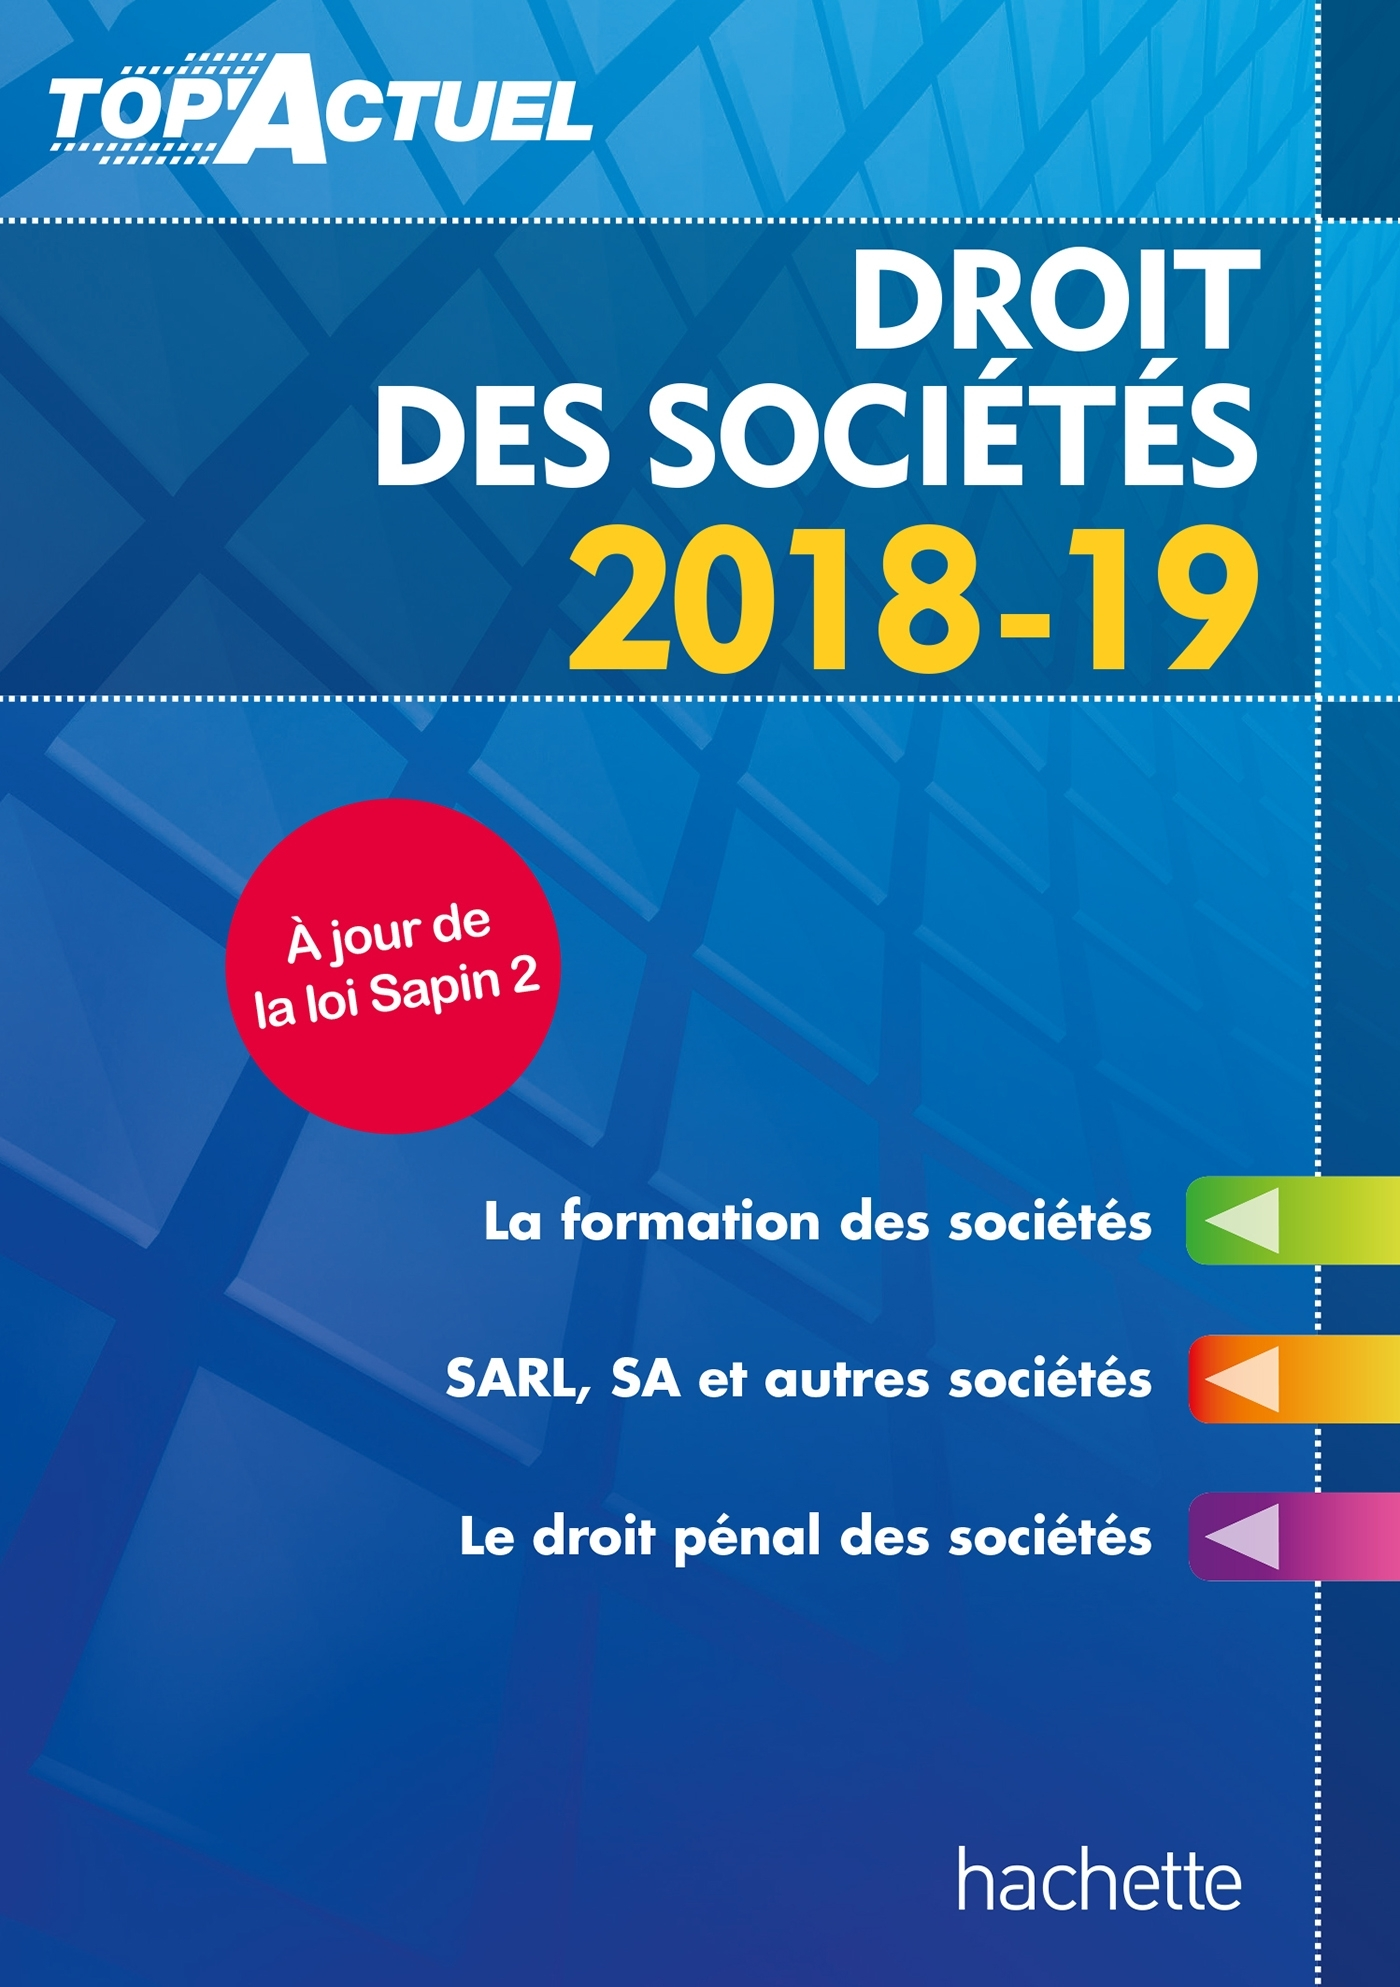 TOP'ACTUEL DROIT DES SOCIETES 2018-2019